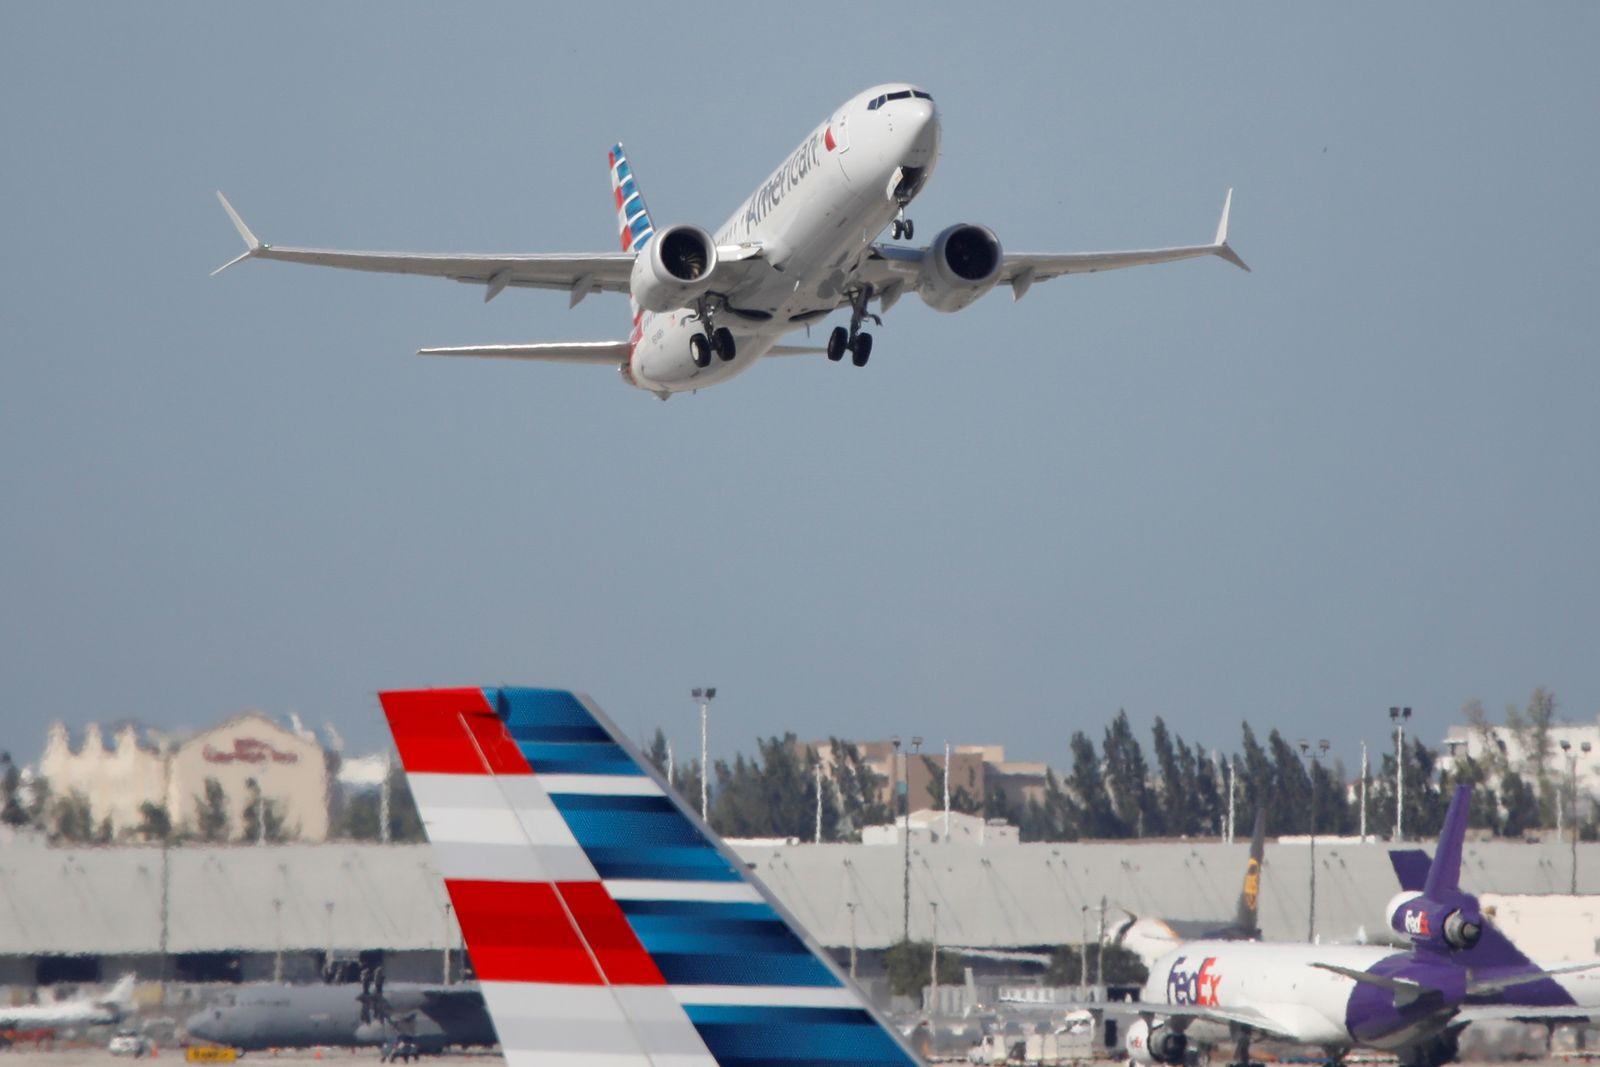 FILE PHOTO: Boeing 737 MAX resumes U.S. passenger flights after safety ban